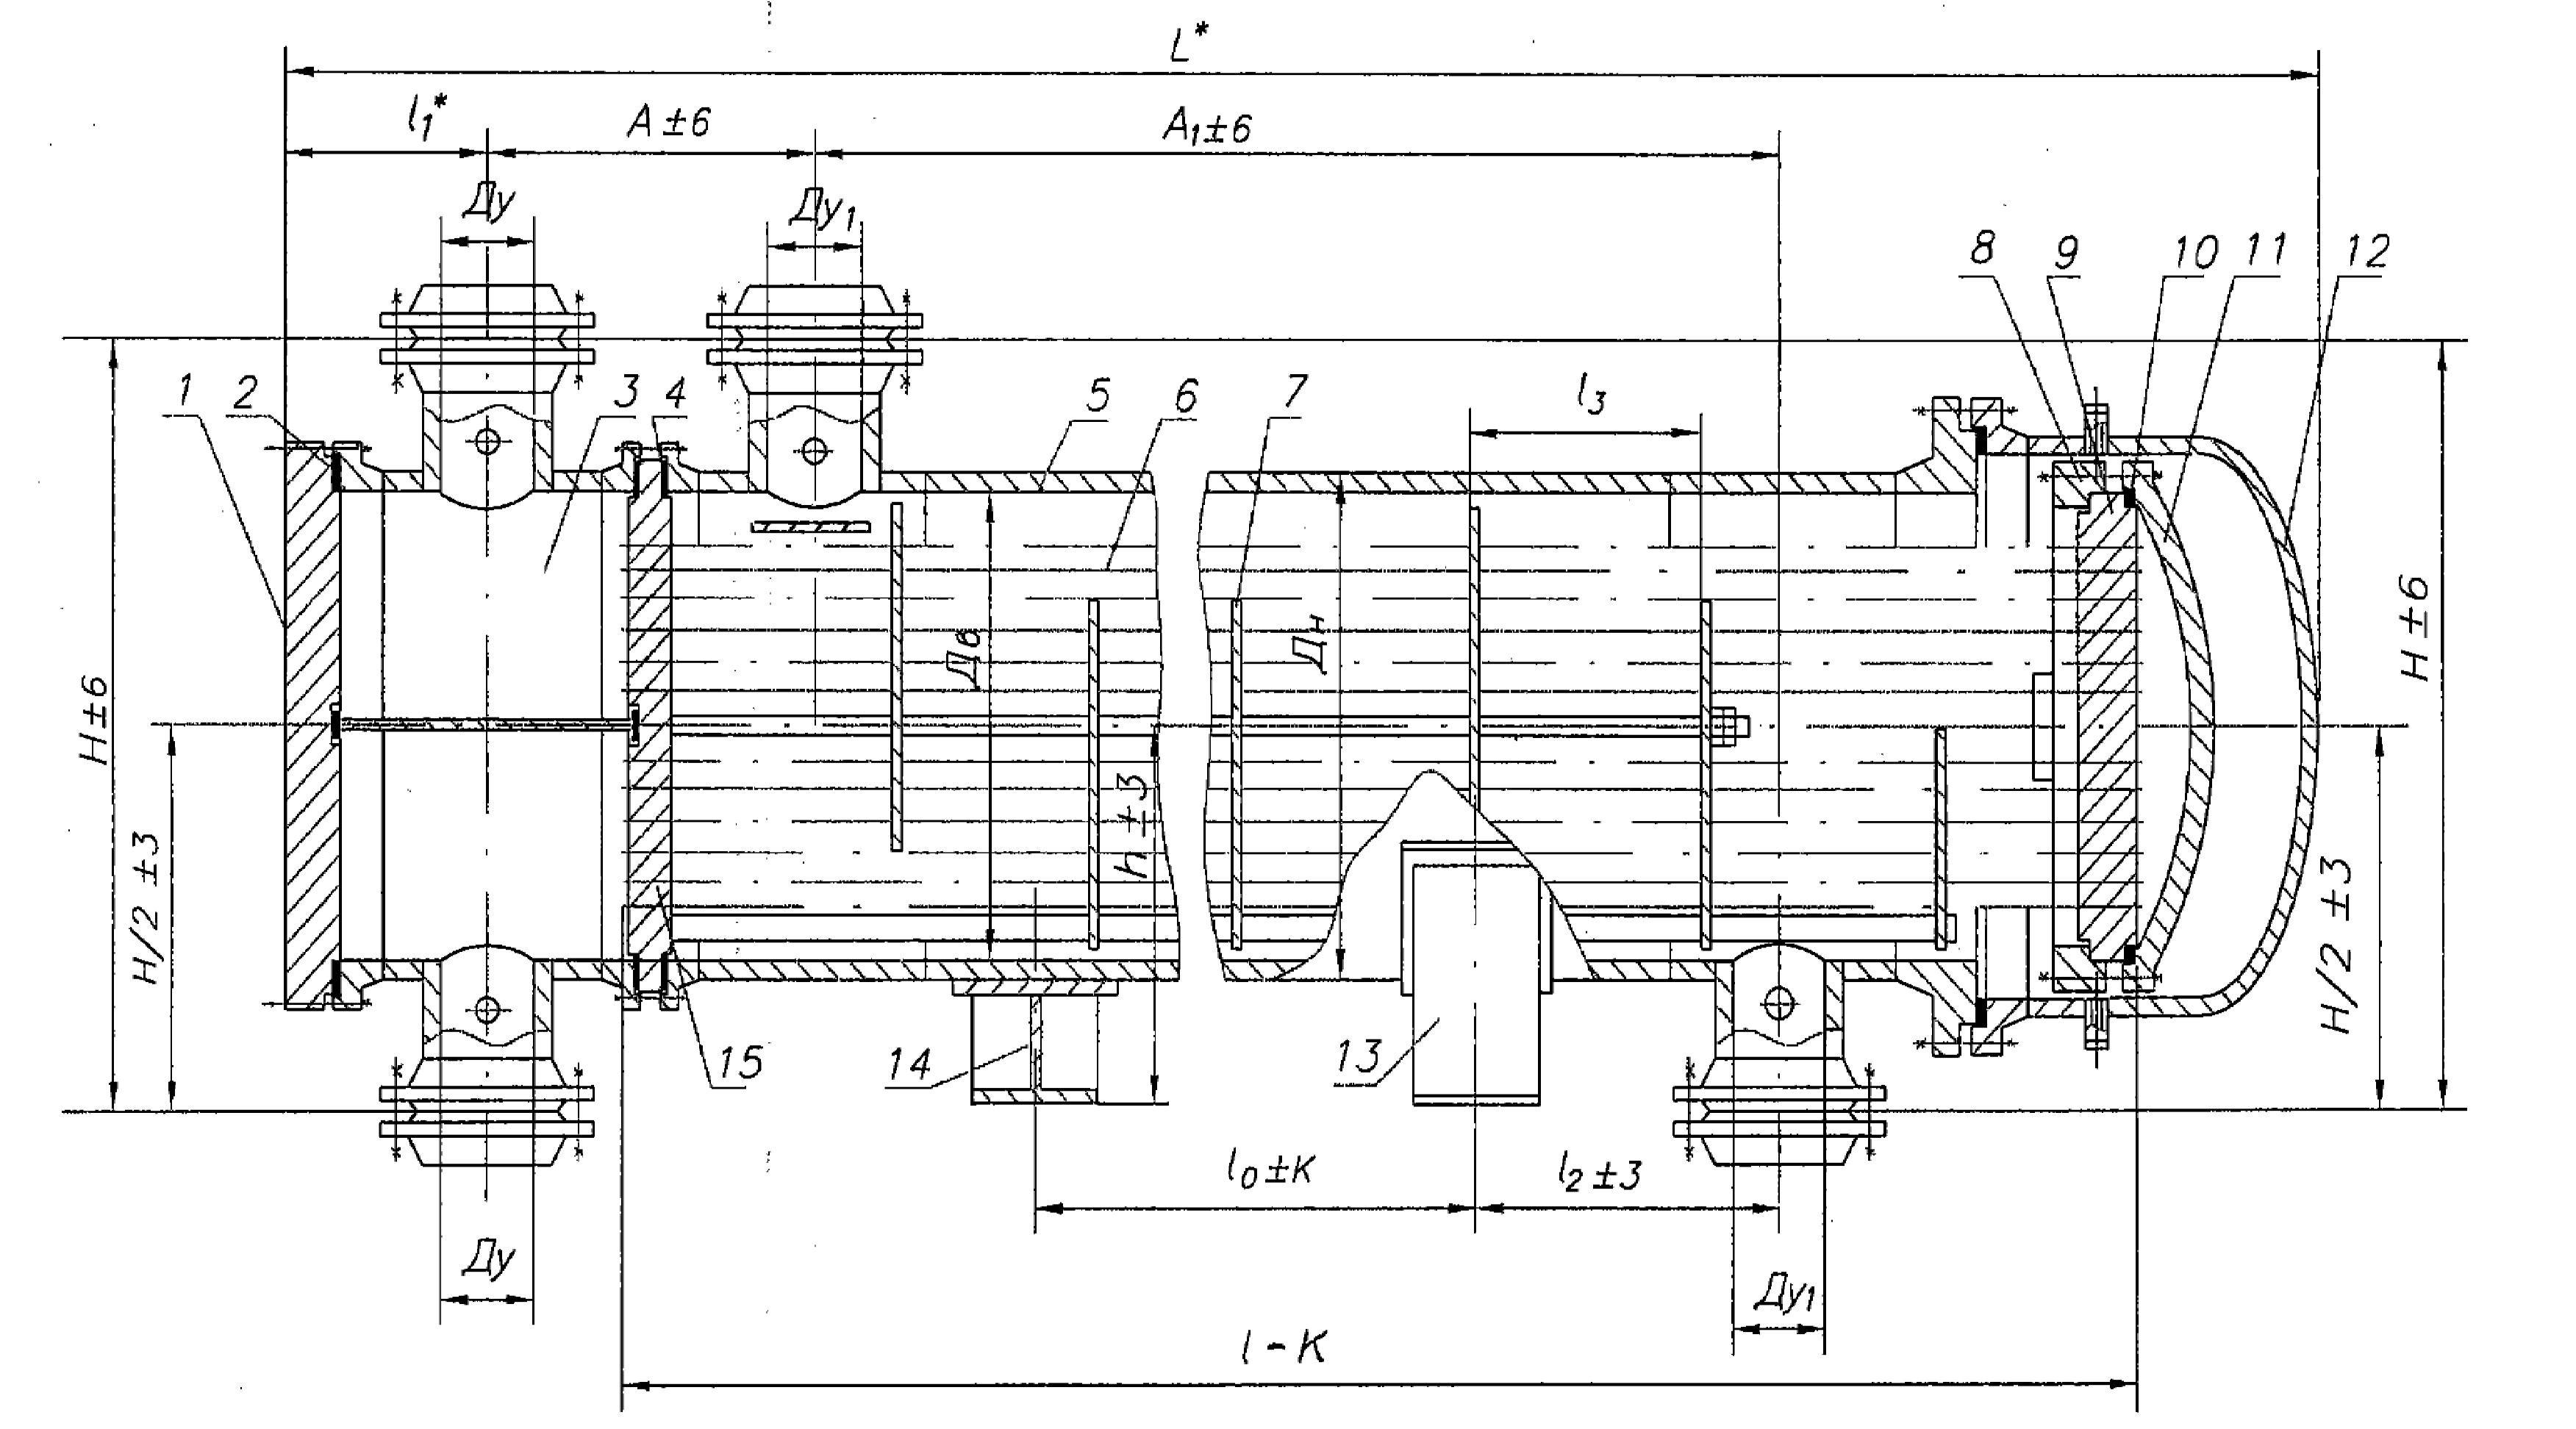 Пластинчатый теплообменник Sondex S221 Миасс